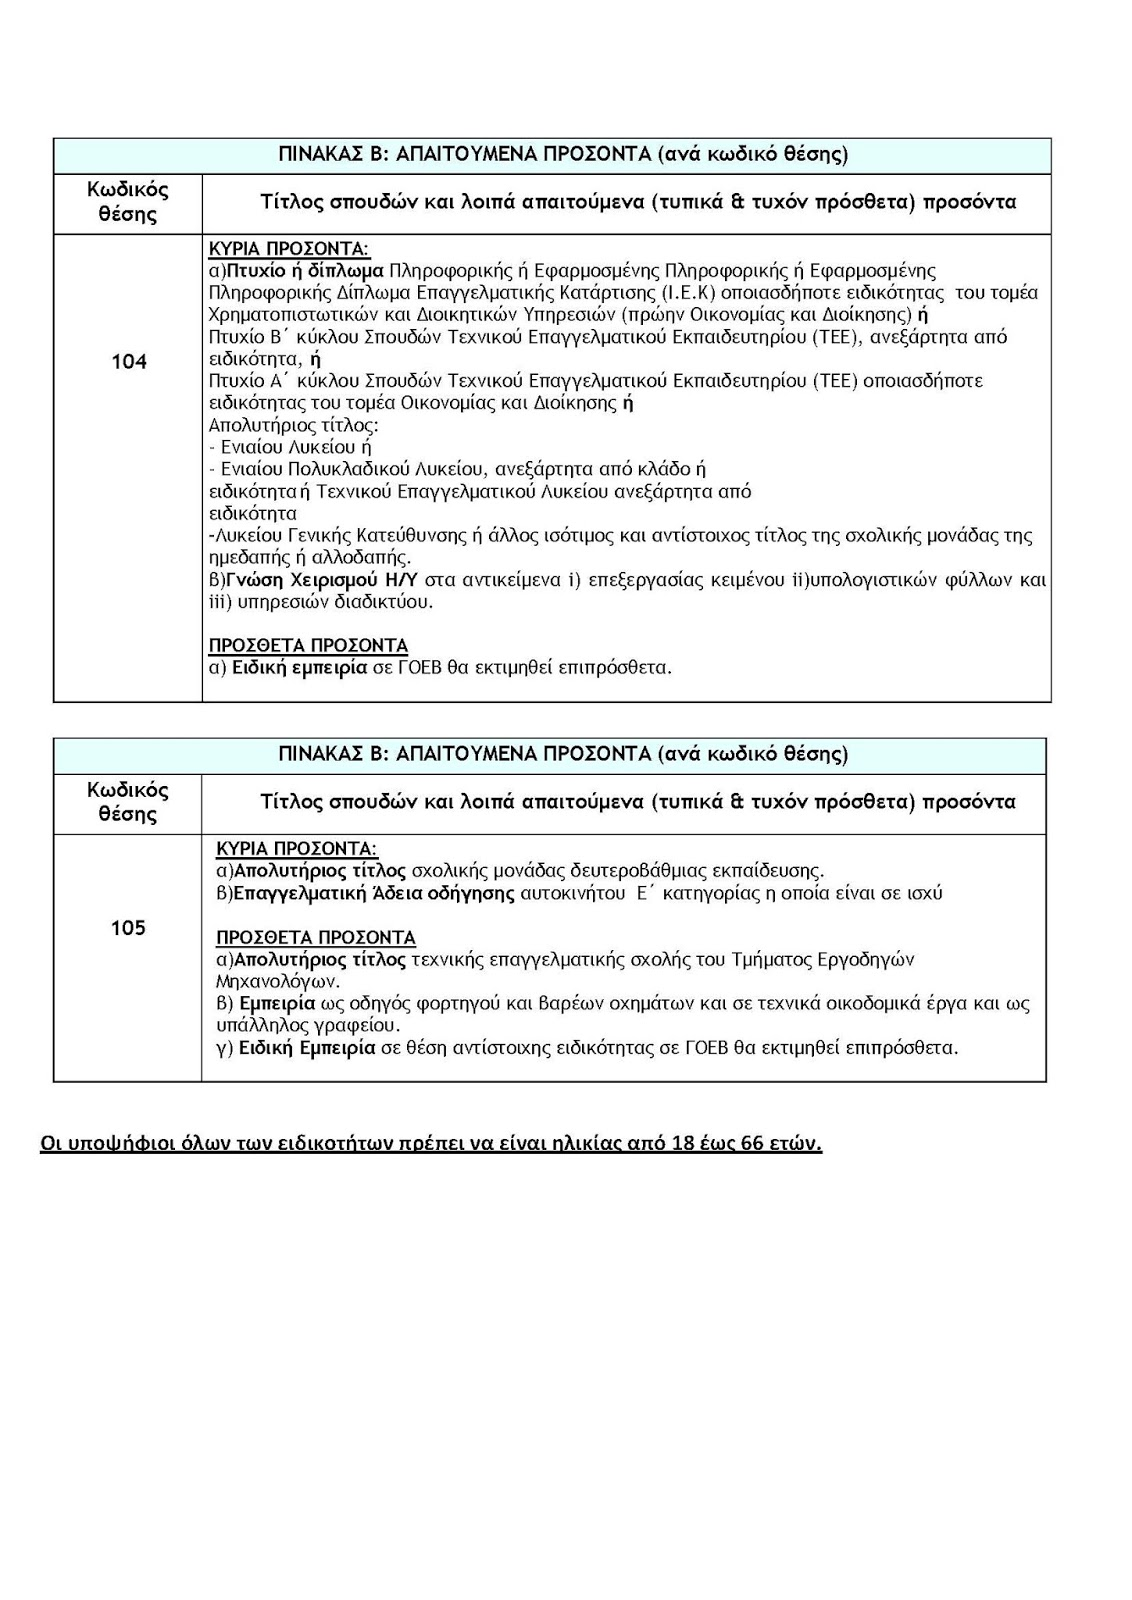 dcd39c58d063 Προσλήψεις 6 υπαλλήλων αορίστου χρόνου στον ΓΟΕΒ Λάρισας (ΠΡΟΚΗΡΥΞΗ ...